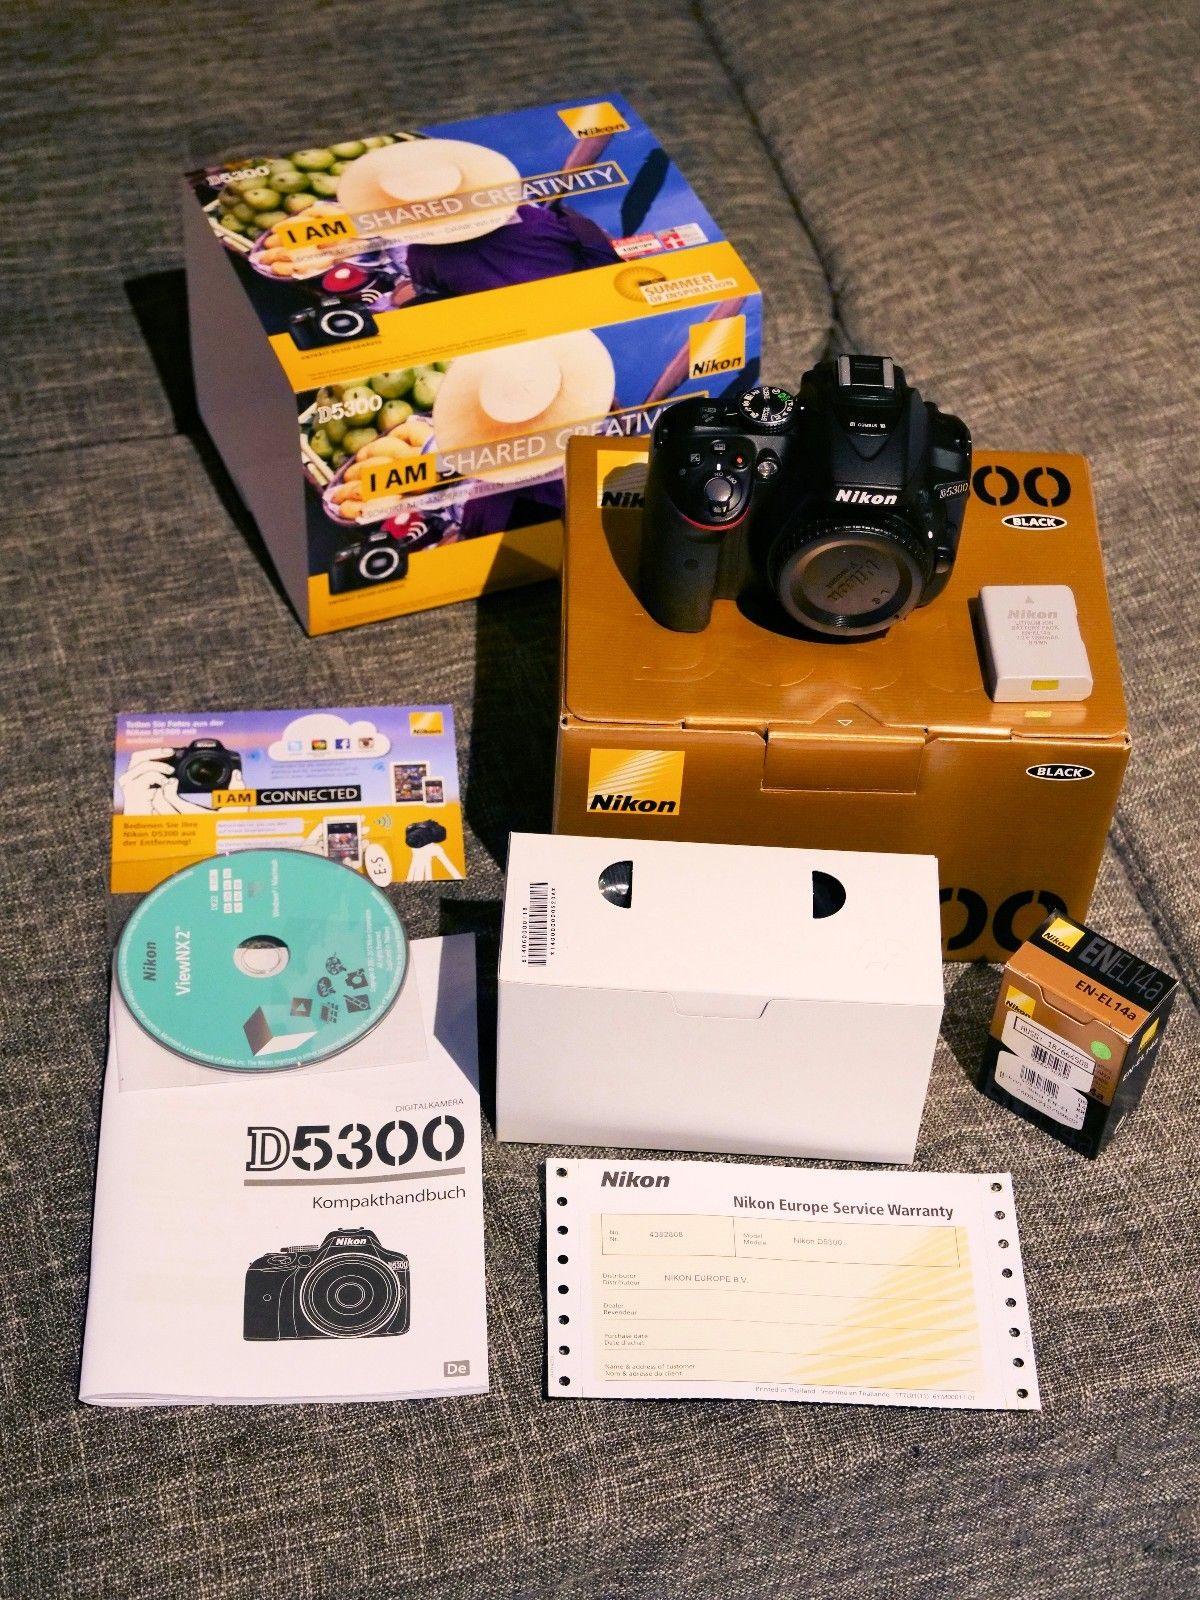 Nikon D D5300 24.2MP Digitalkamera - Anthrazit (Nur Gehäuse)